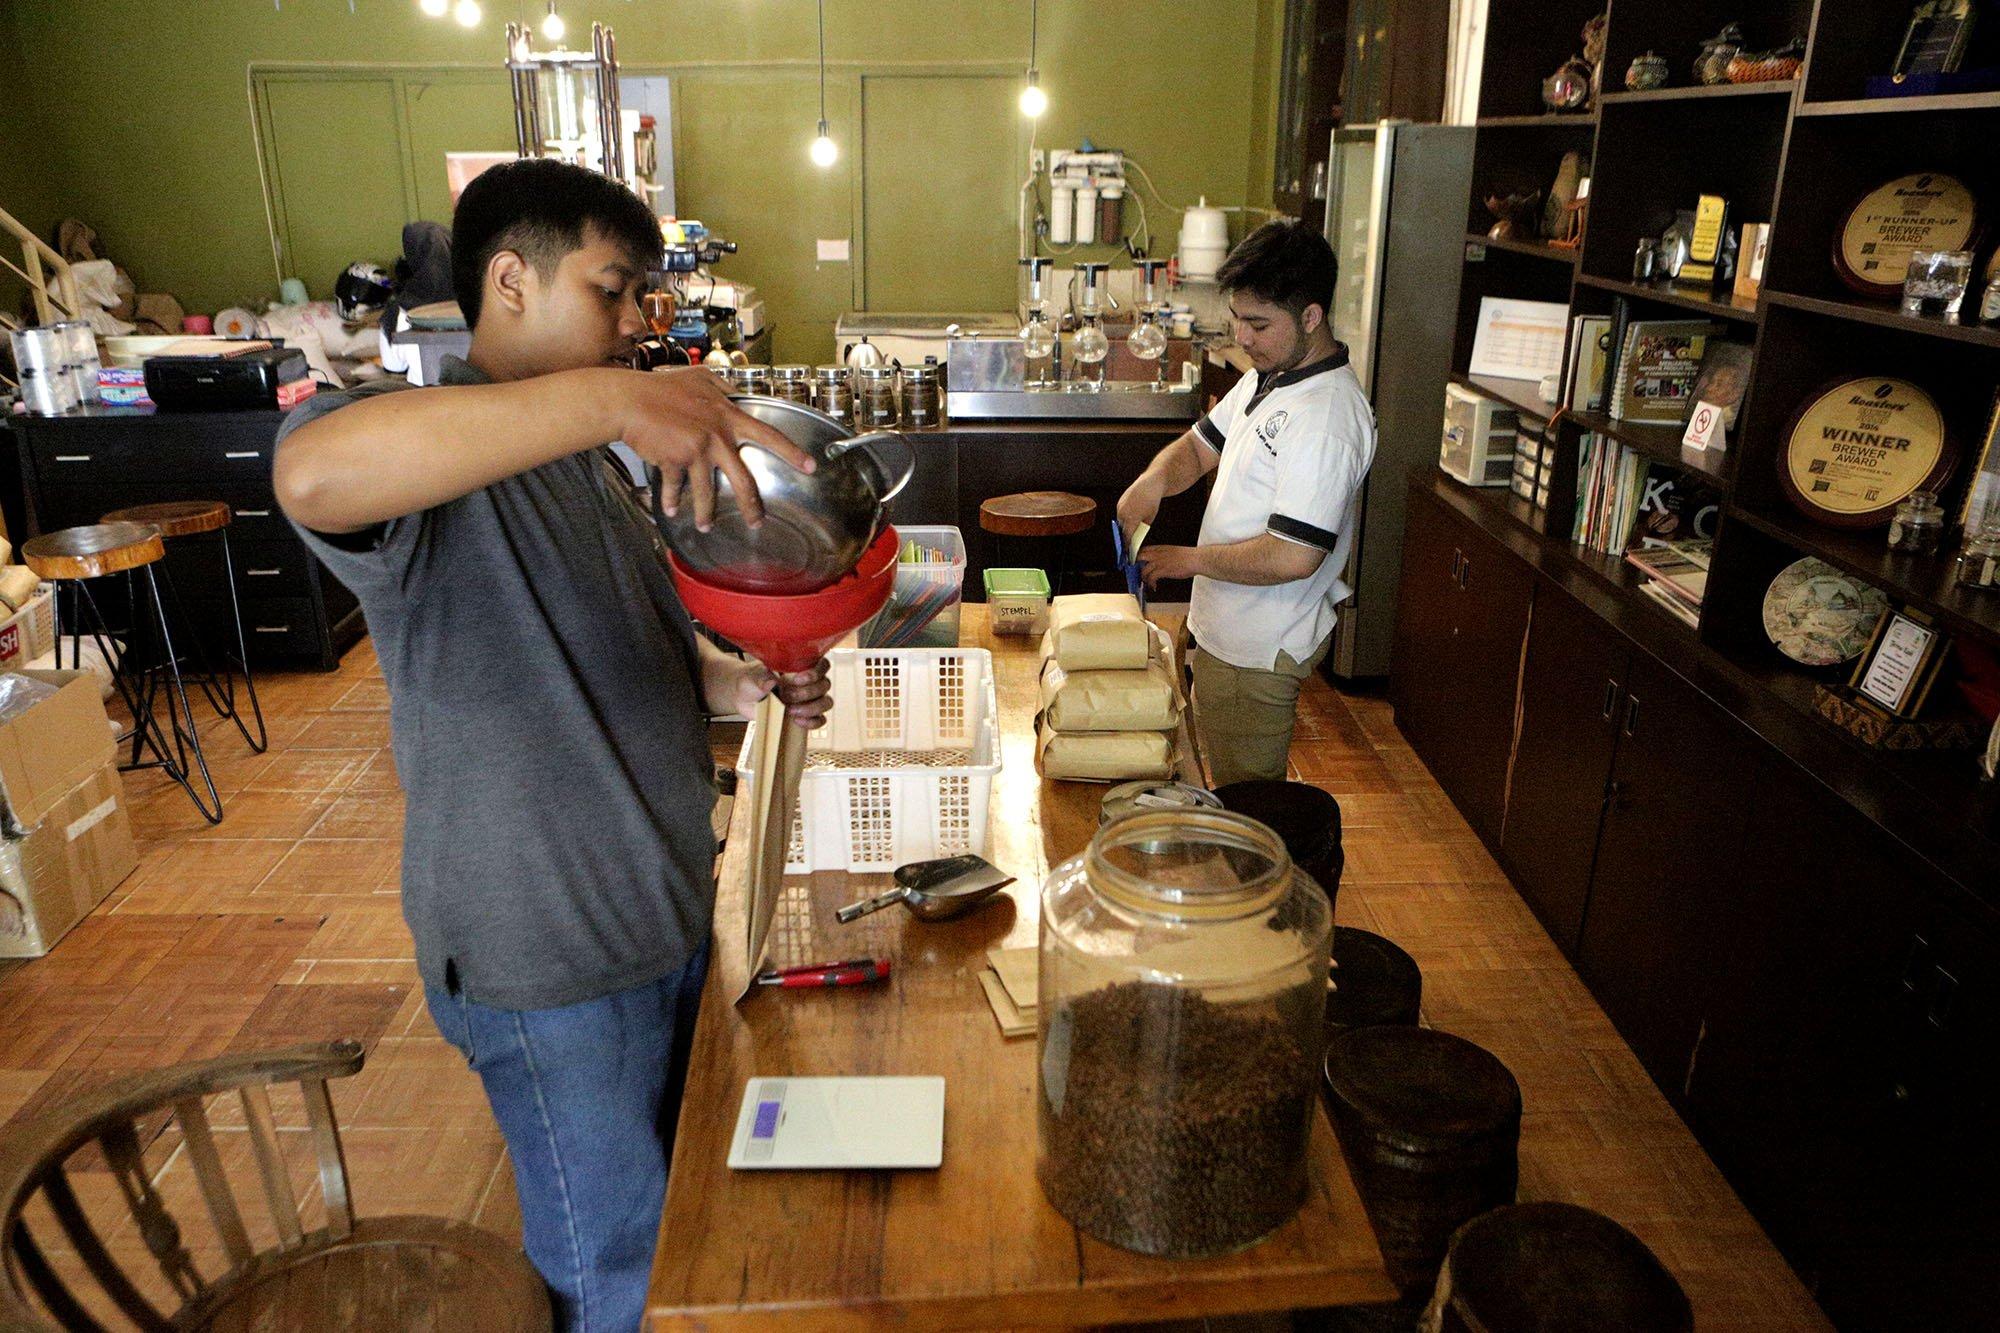 Suasana pembungkusan kopi di warung kopi Malabar Mountain Coffee, Bogor, (13/11/2019). \r\n\r\n